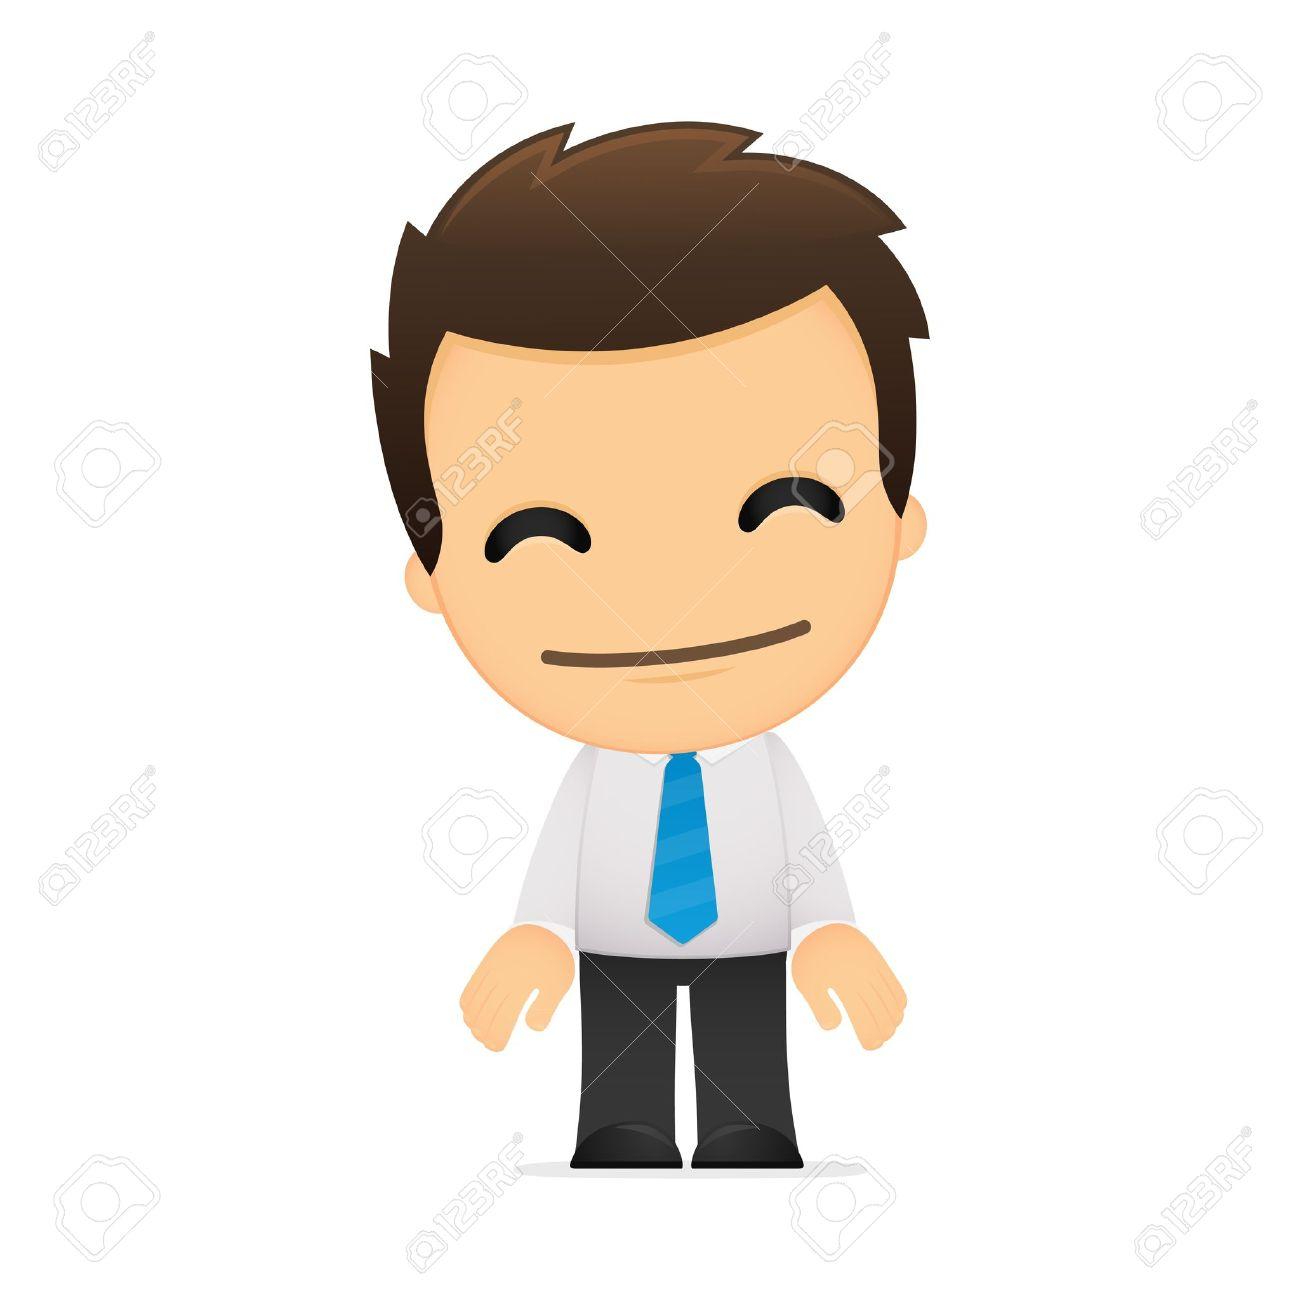 Business team cartoon characters cartoon vector cartoondealer com - Cartoon Man Funny Cartoon Office Worker Illustration